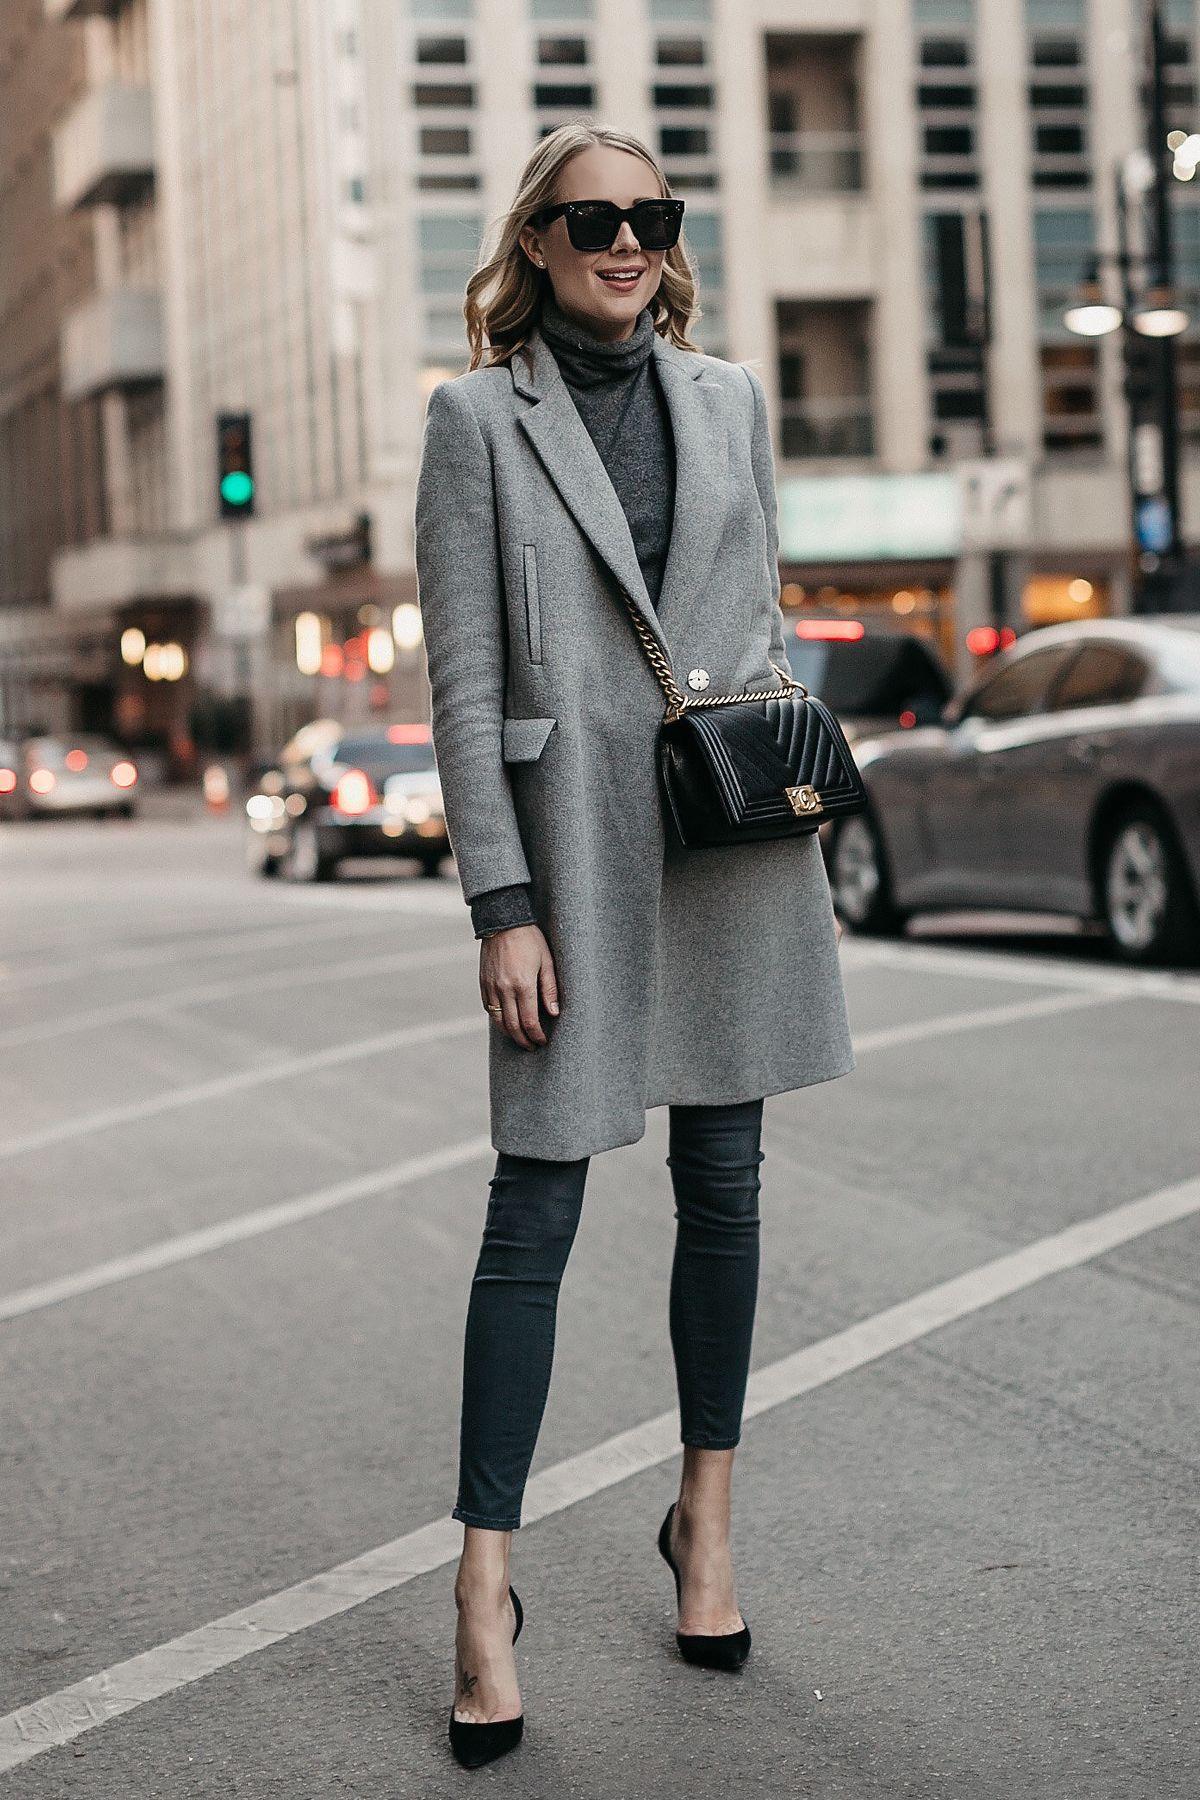 b3e46462fdd826 Blonde Woman Wearing Grey Coat Grey Turtleneck Sweater Grey Skinny Jeans  Black Pumps Black Chanel Boy Bag Fashion Jackson Dallas Blogger Fashion  Blogger ...